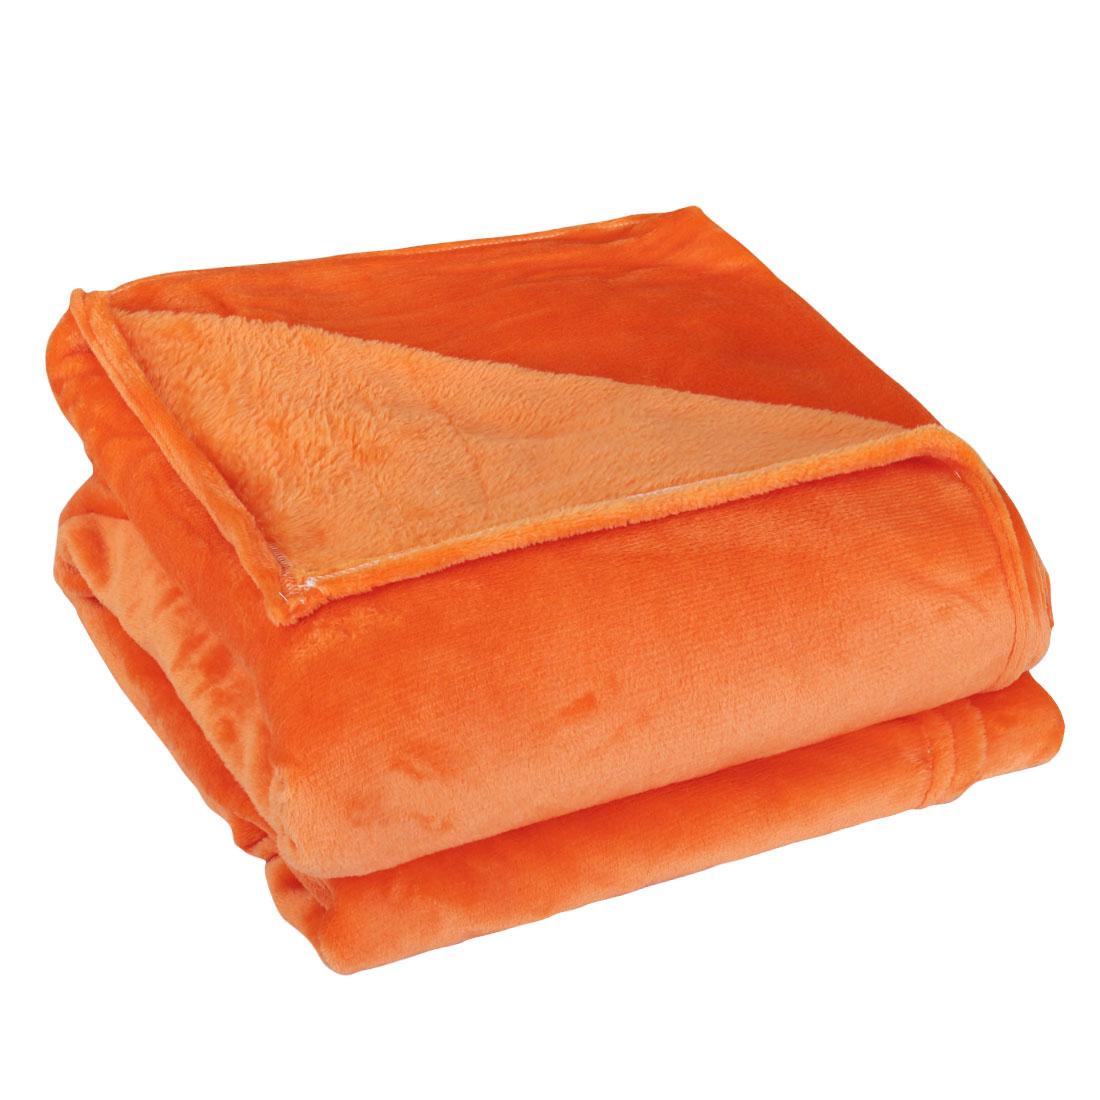 230 x 250cm Home Bedroom Warm Throw Blanket Rug Plush Fleece Bed Quilt Sofa Soft Pure Orange